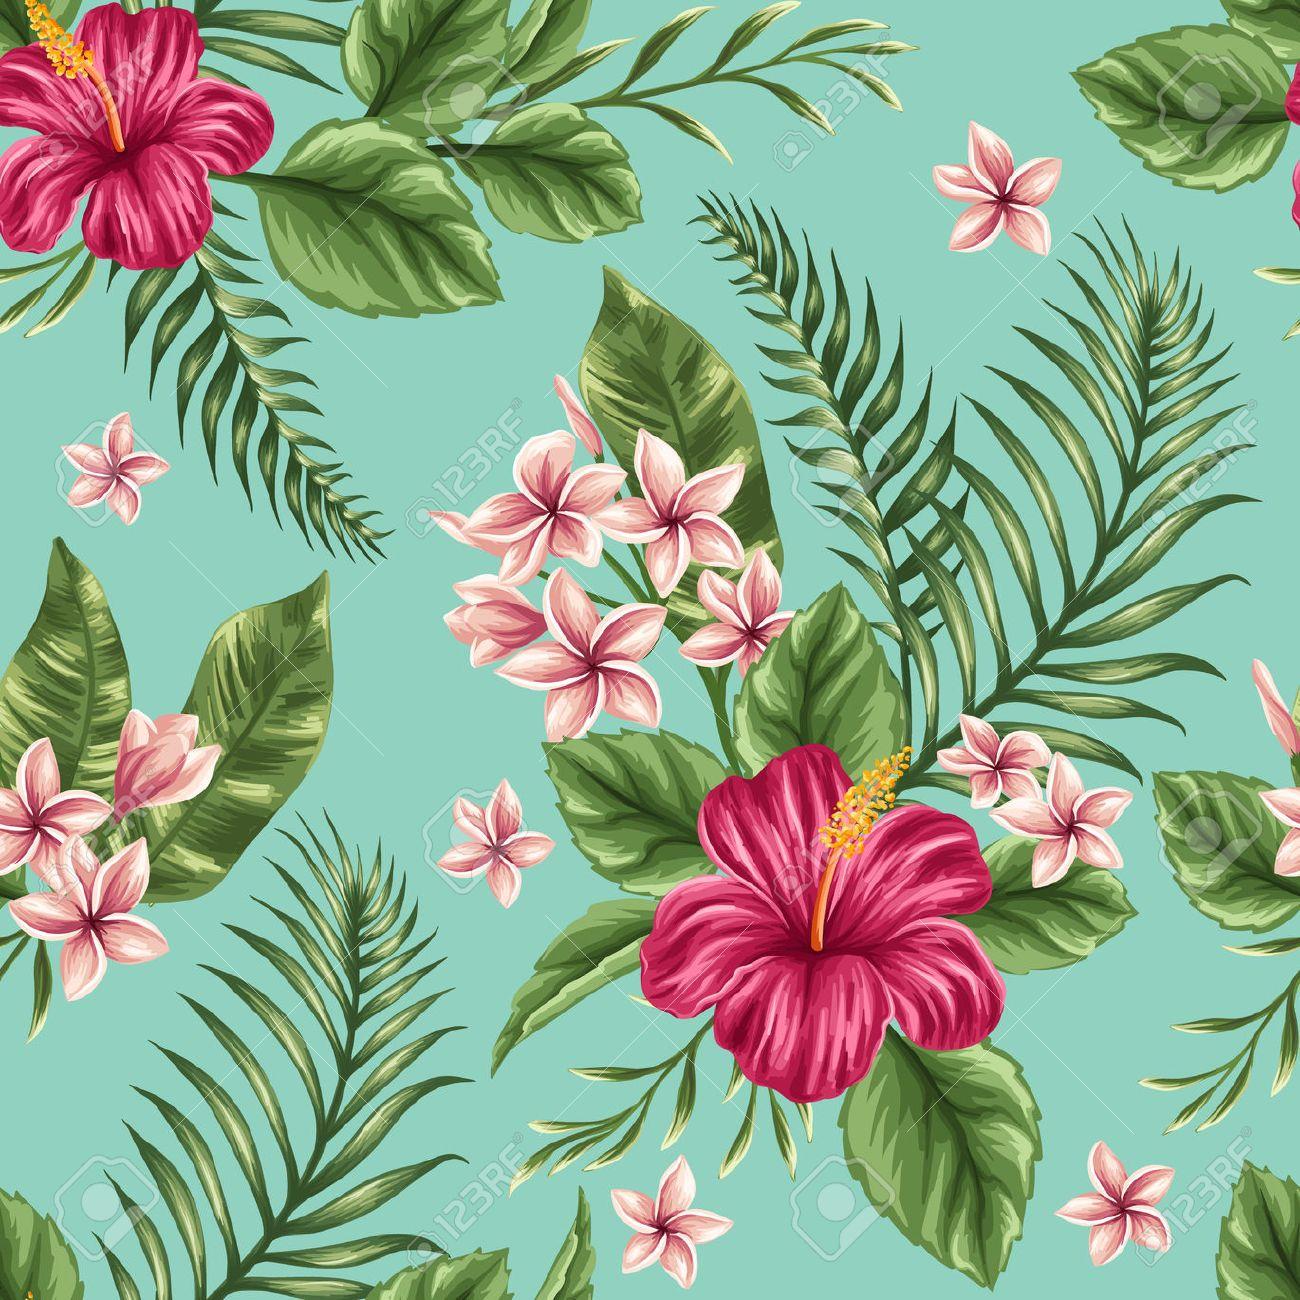 tropical flower pattern - Google 搜尋 | Prints | Pinterest ...